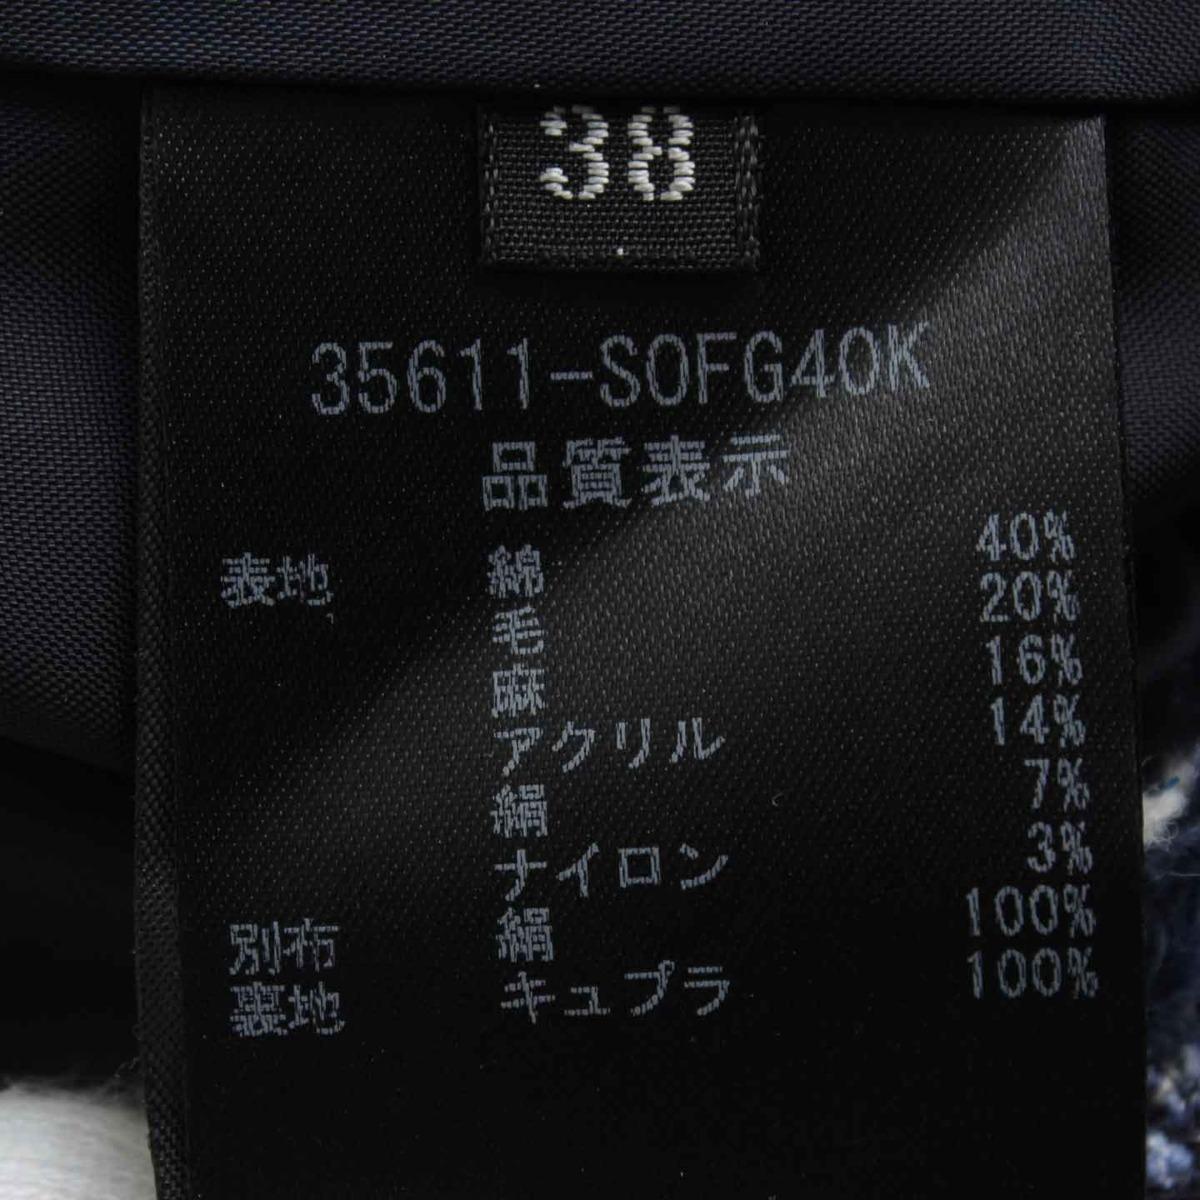 35611-2